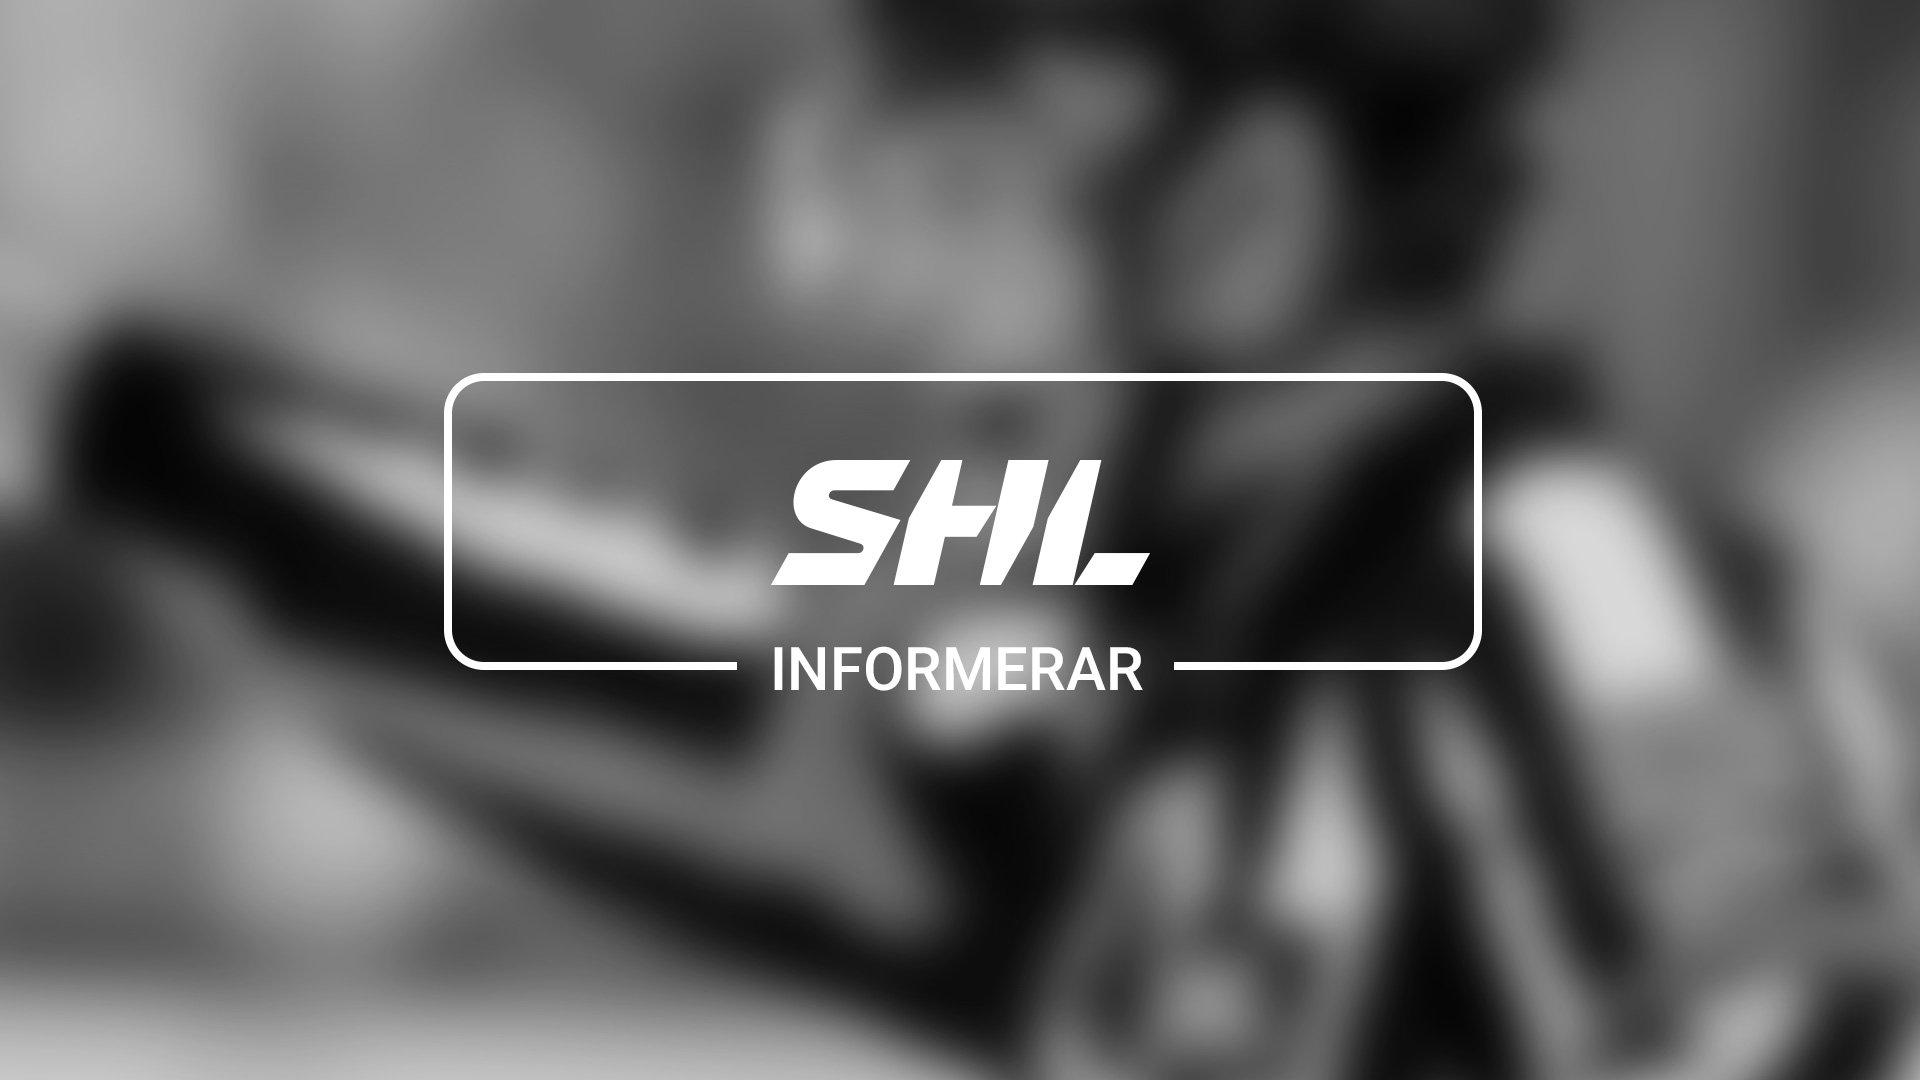 2019-01-17 HV71-LHF, Karl Fabricius, ej godkänt mål